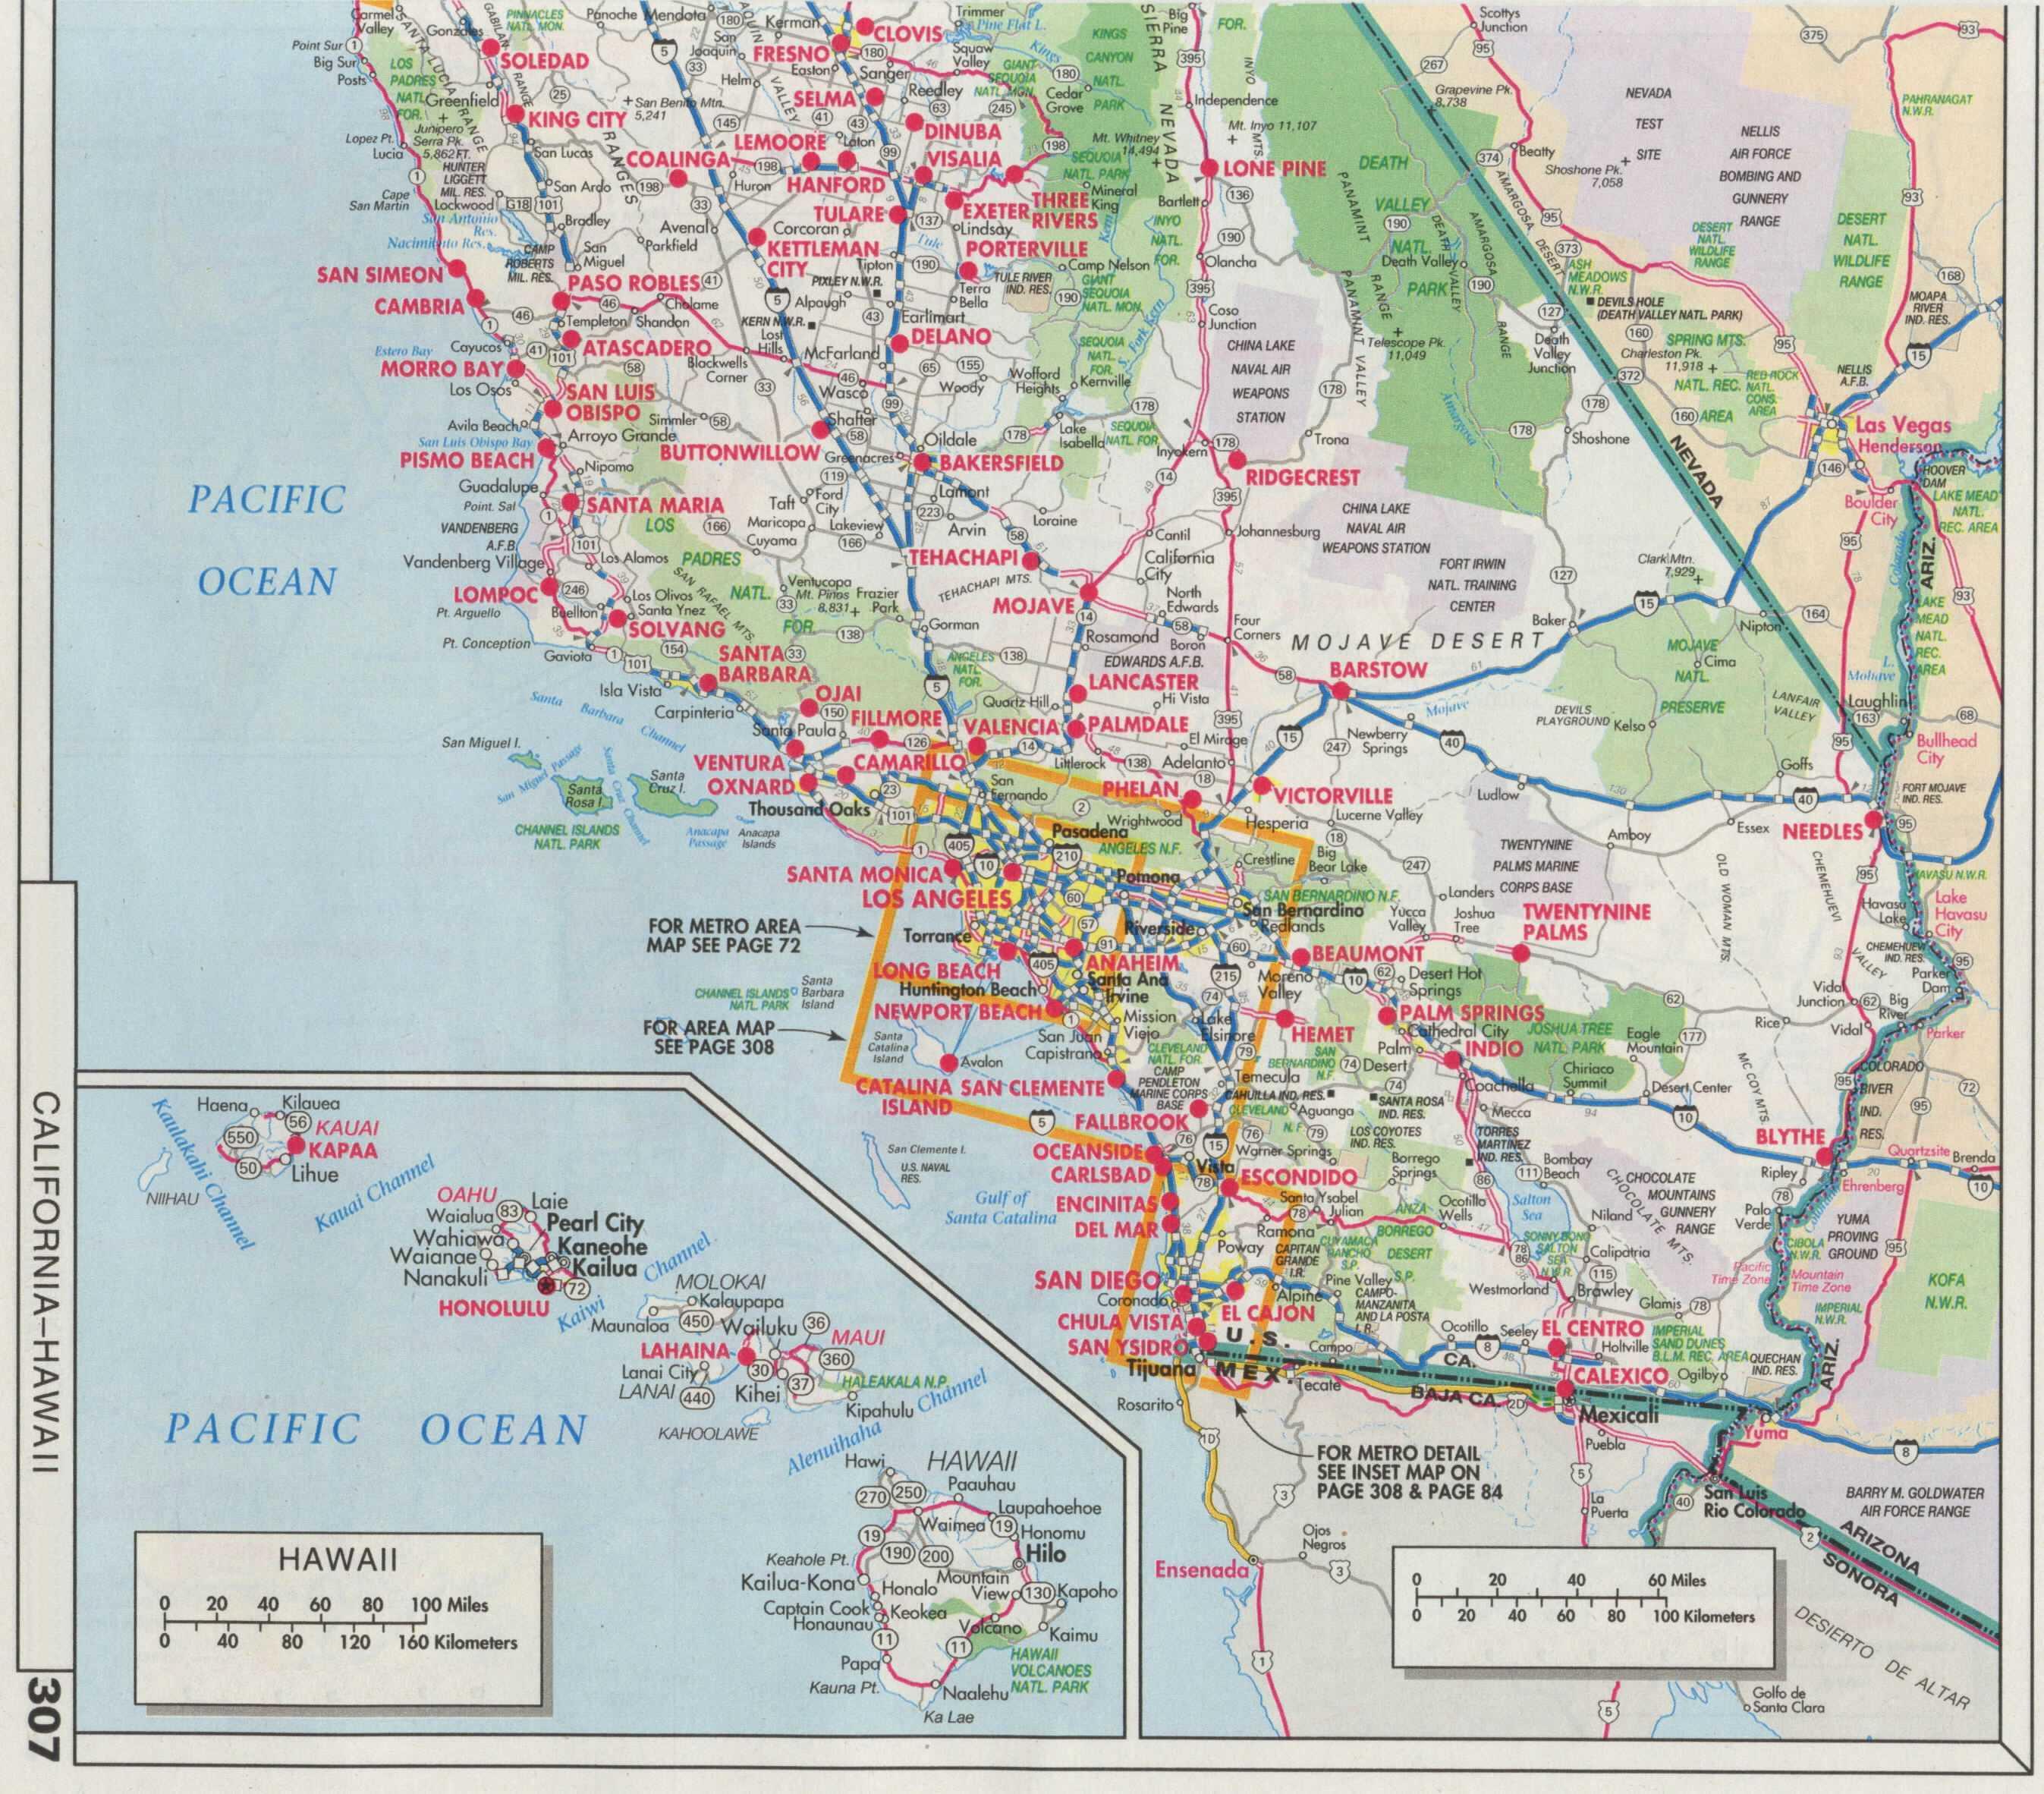 Lametro Driving Map Of Southern California High-Quality Map Of Map - Road Map Of Southern California